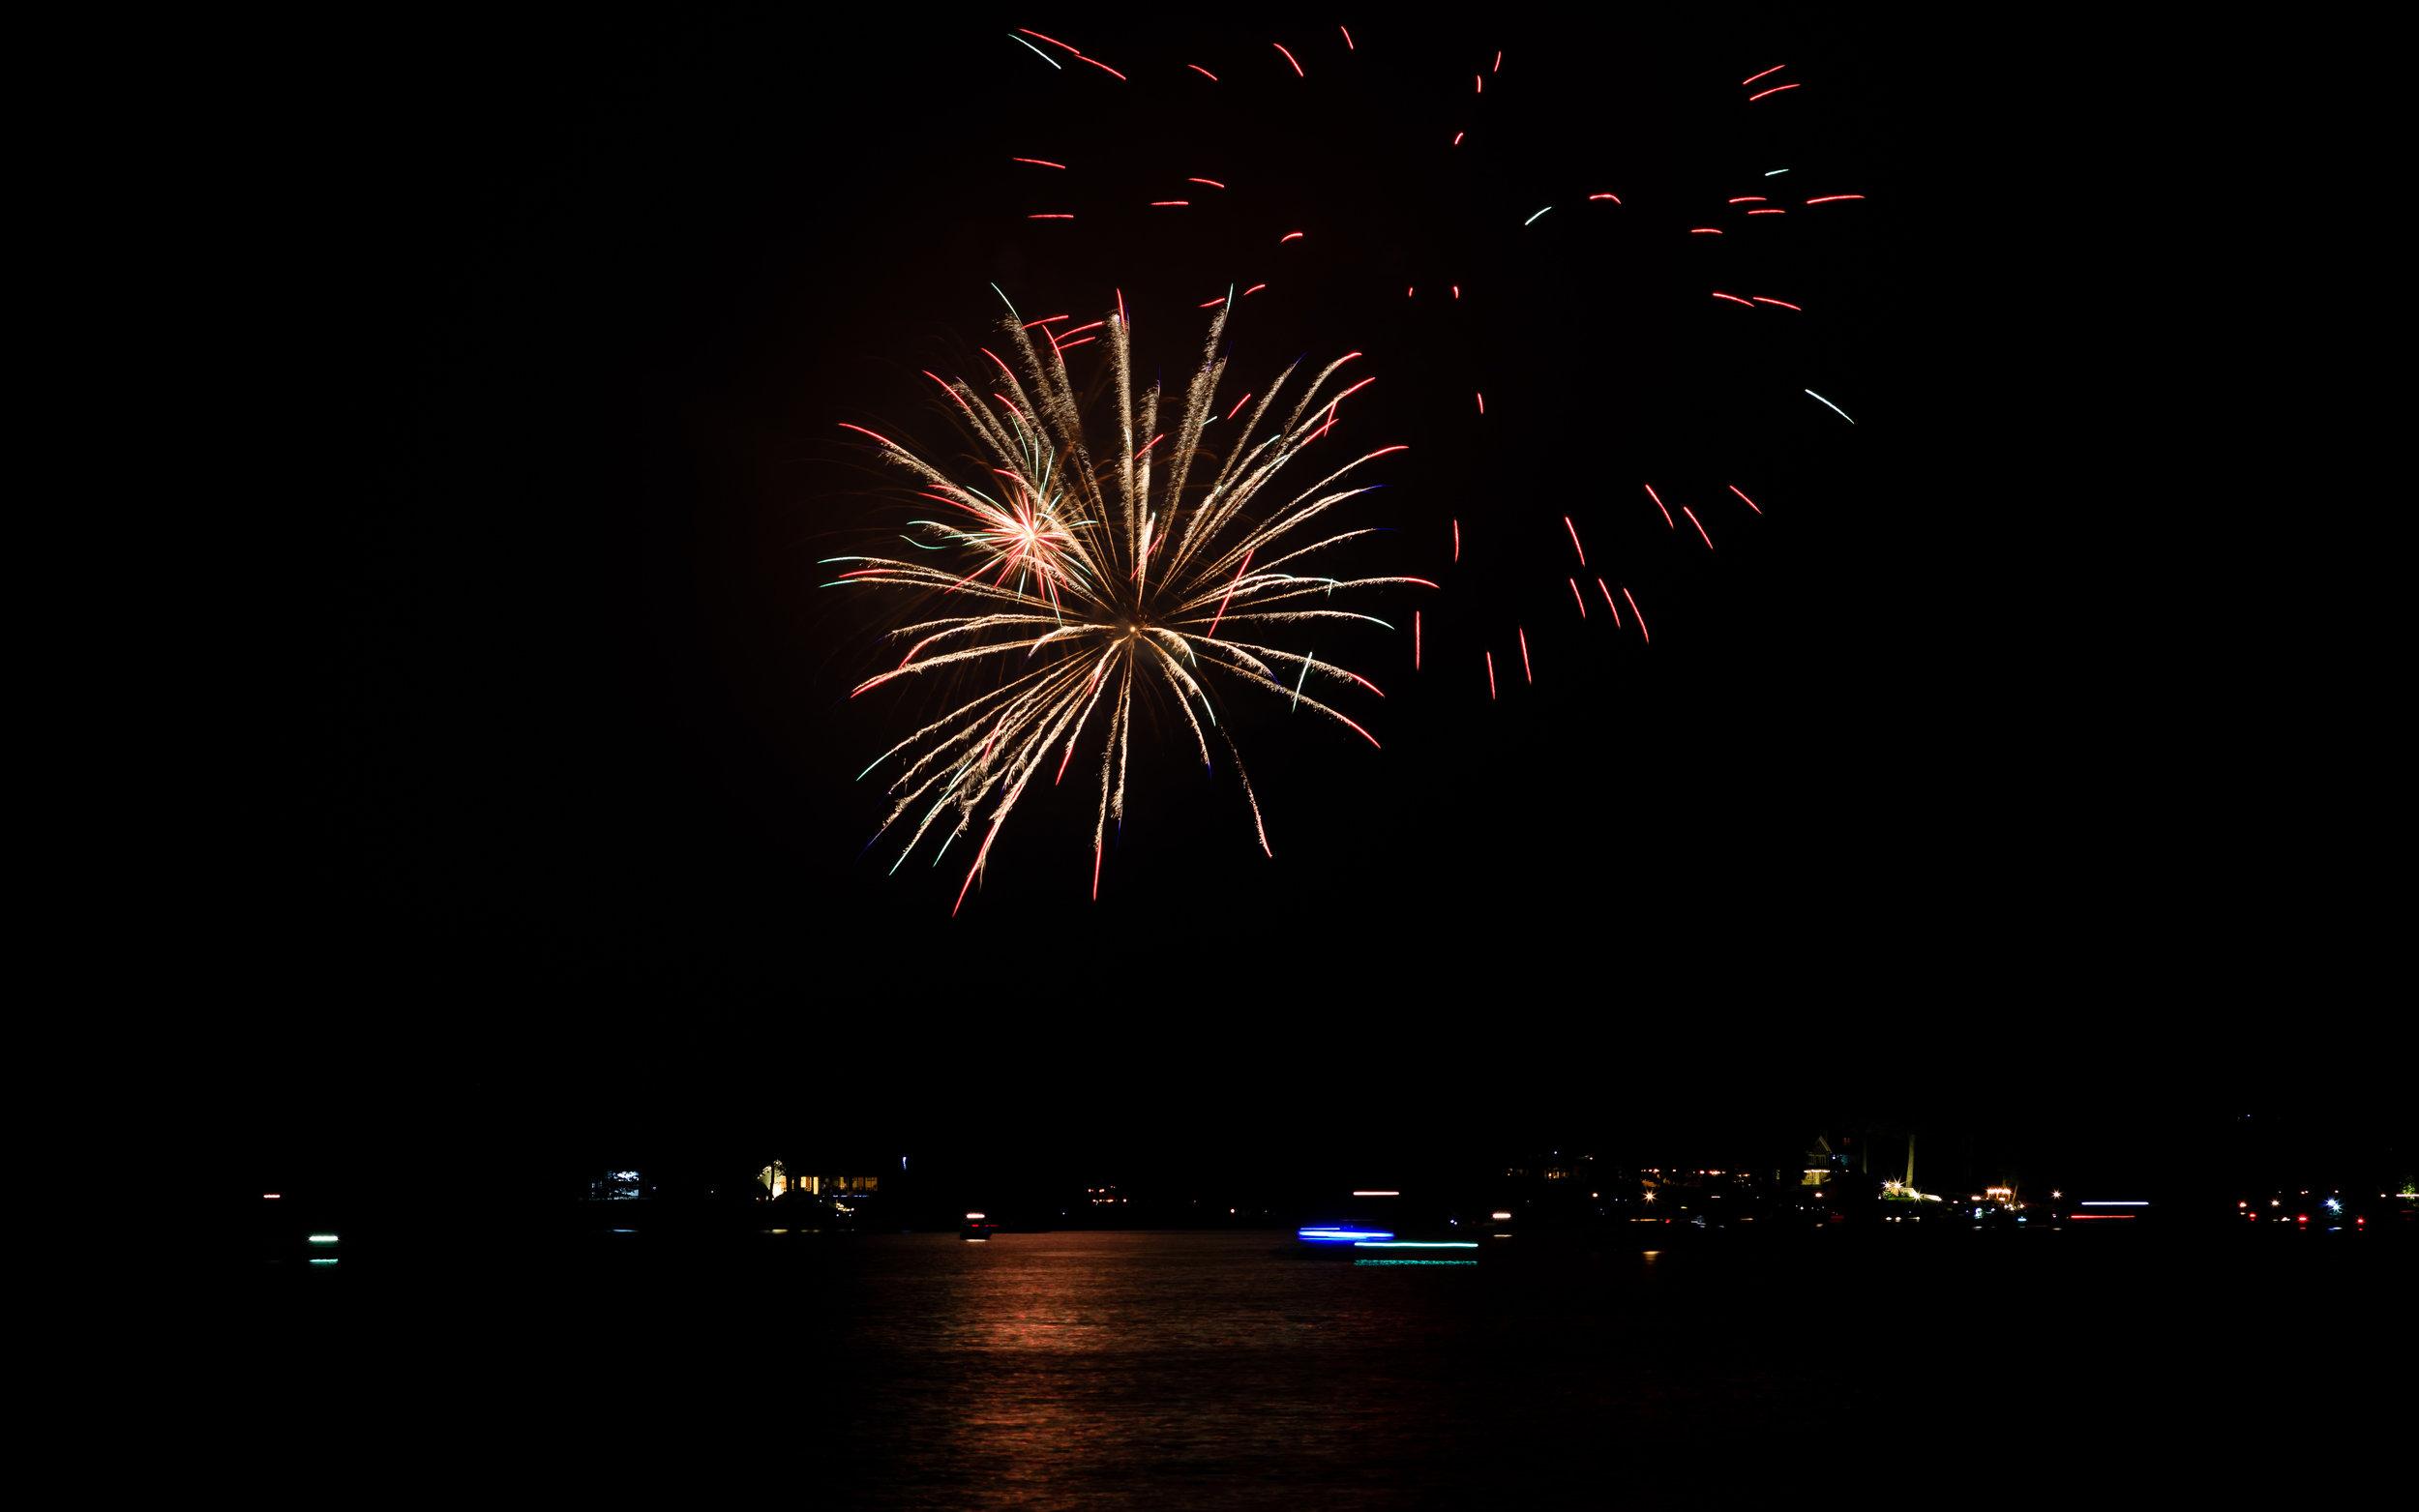 Fireworks-2583.jpg